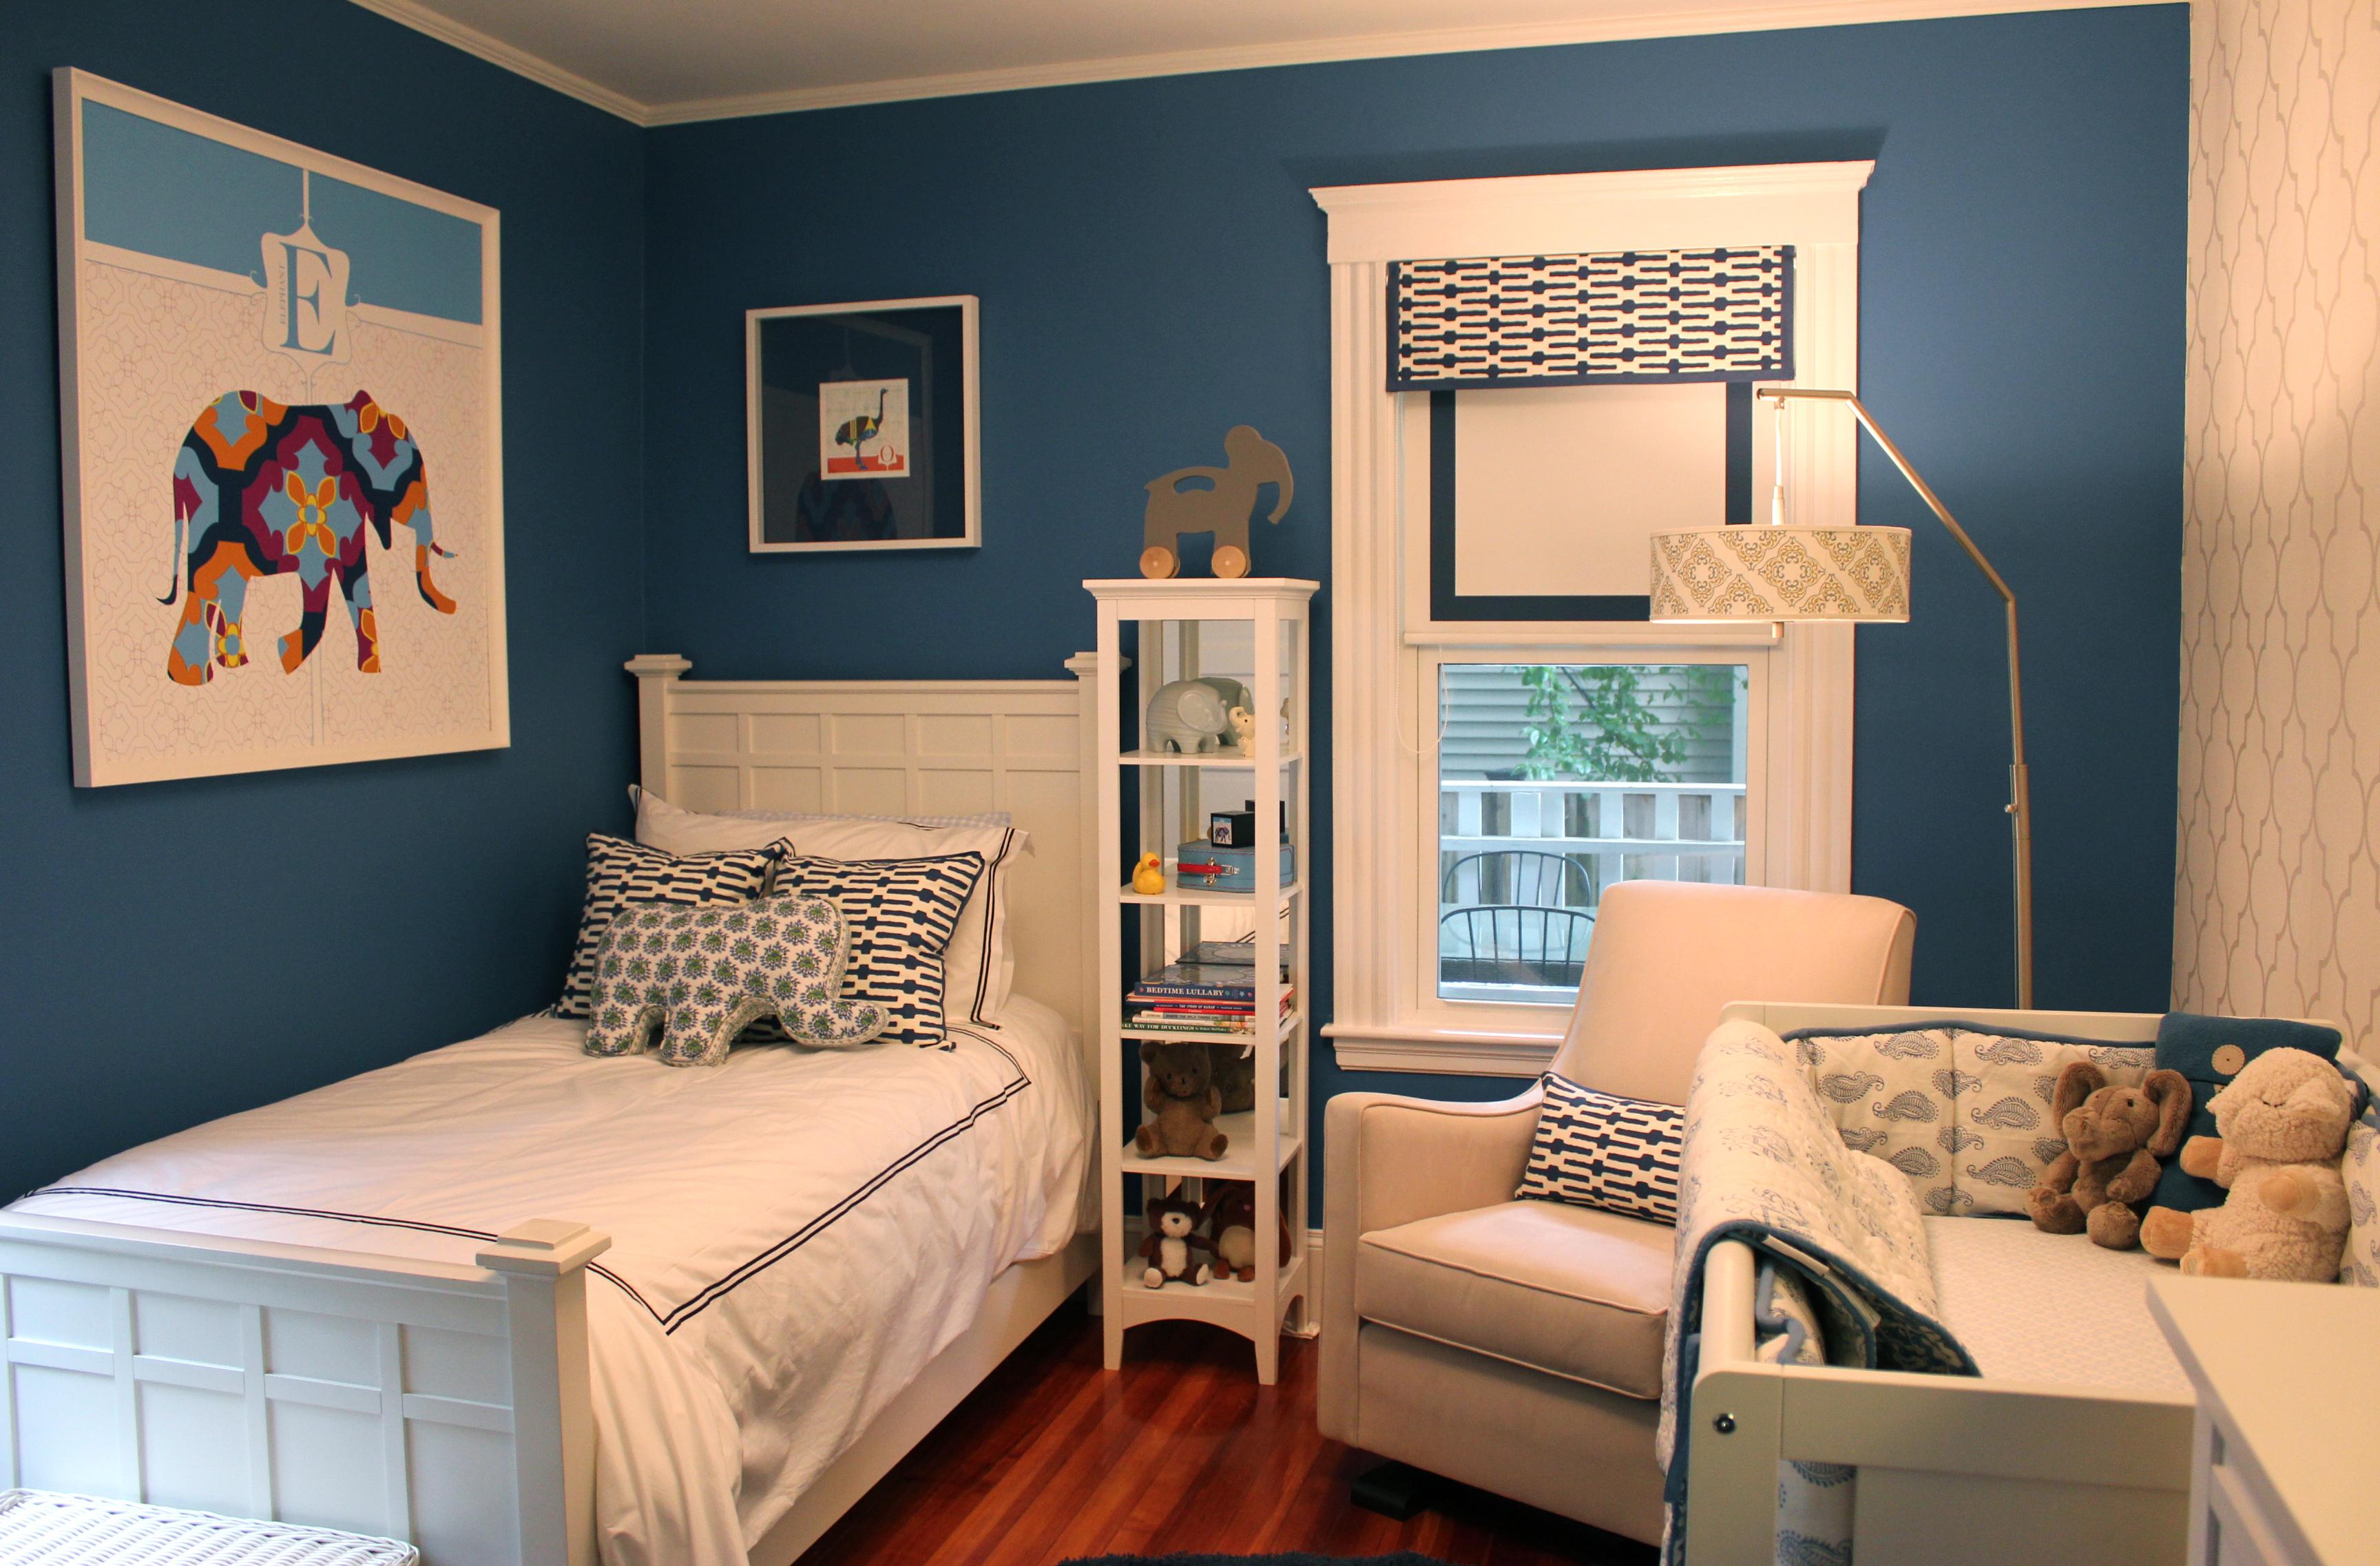 Shared bedroom brooklyn berry designs for Brooklyn bedroom ideas